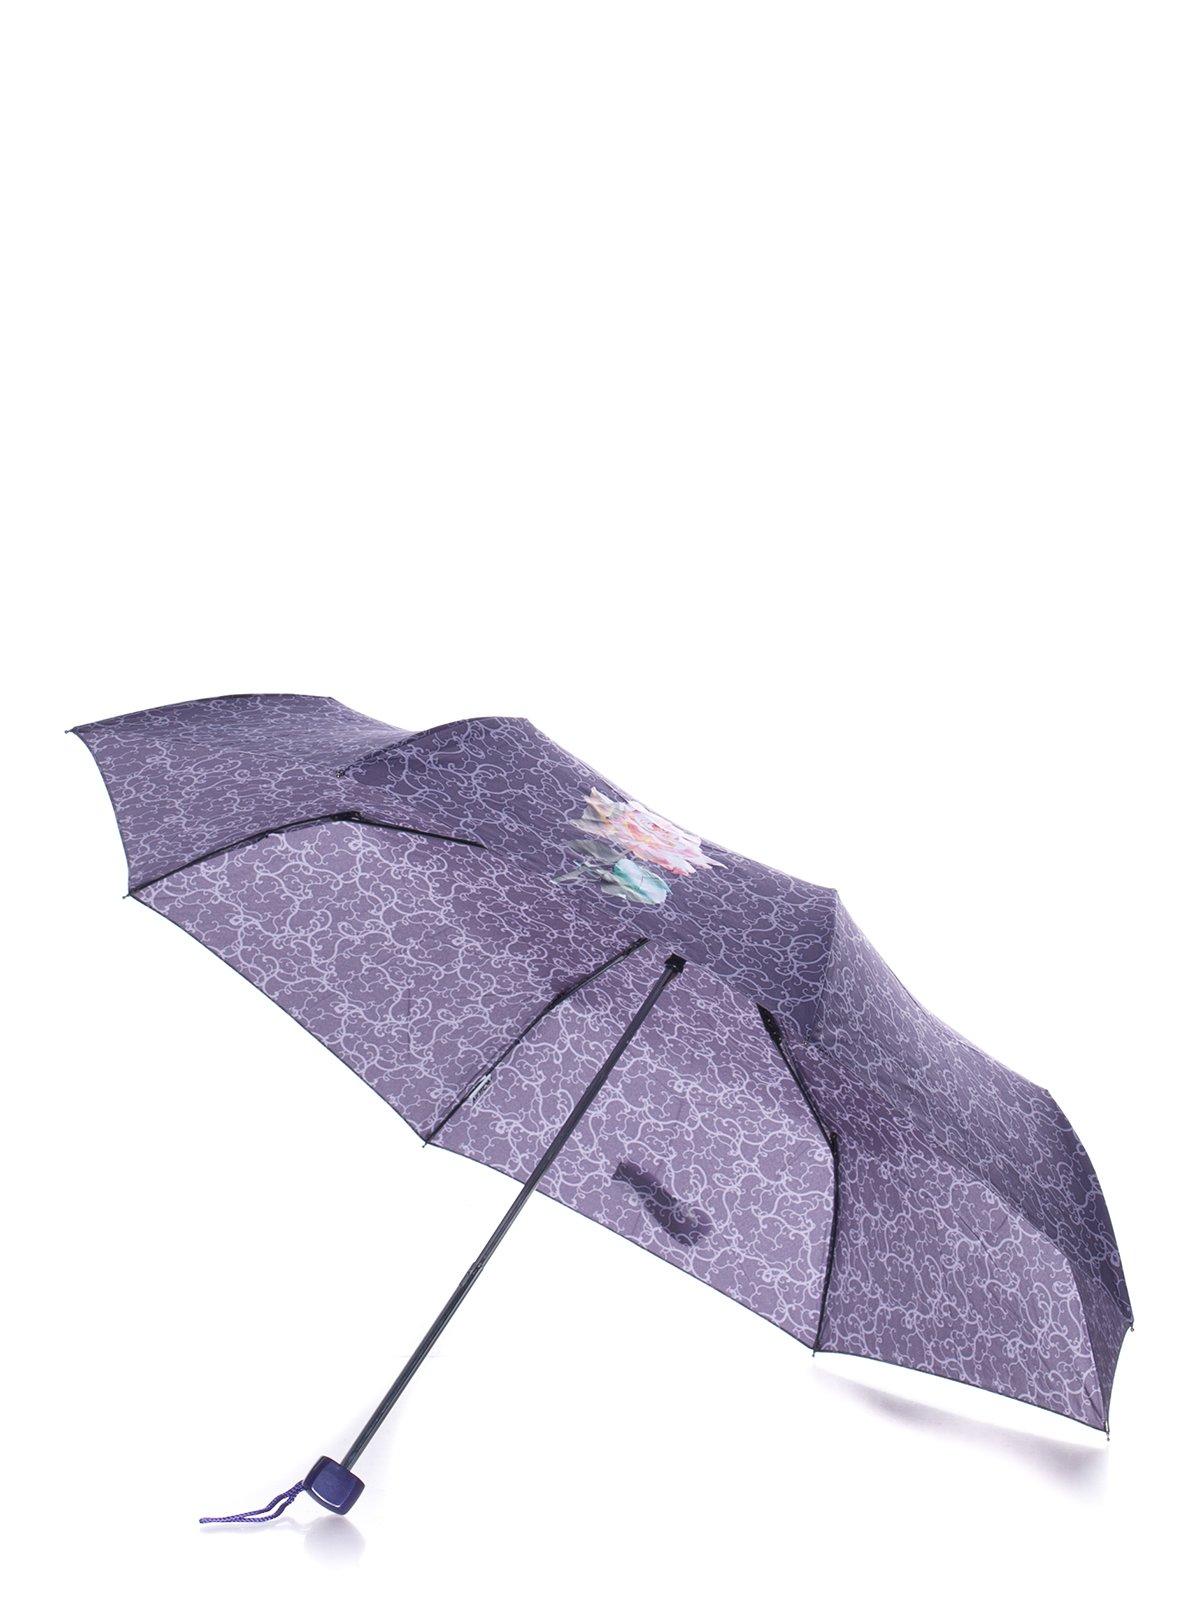 Зонт | 3296663 | фото 2